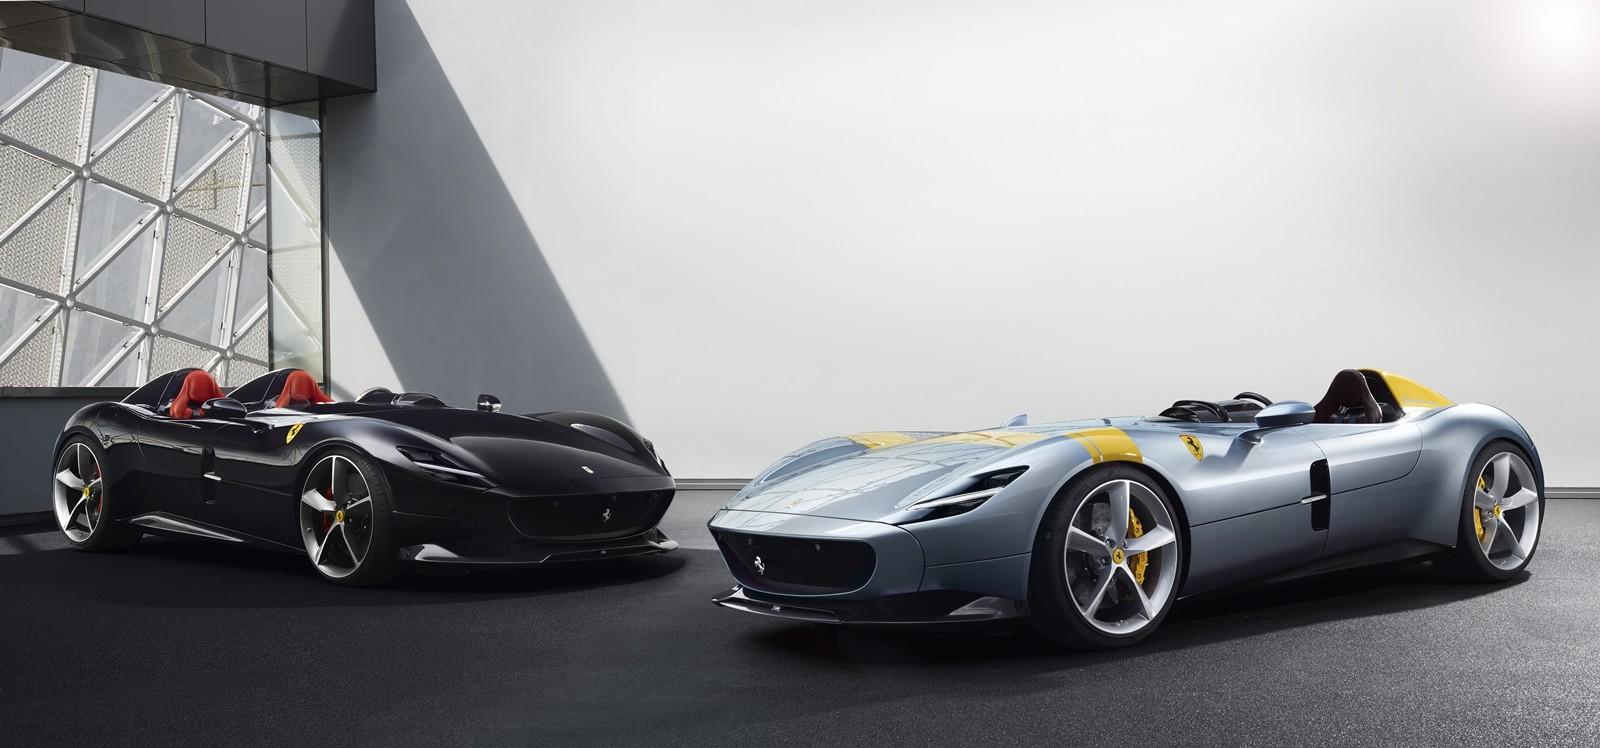 Foto de Ferrari Monza SP1 y Monza SP2 2019 (11/14)